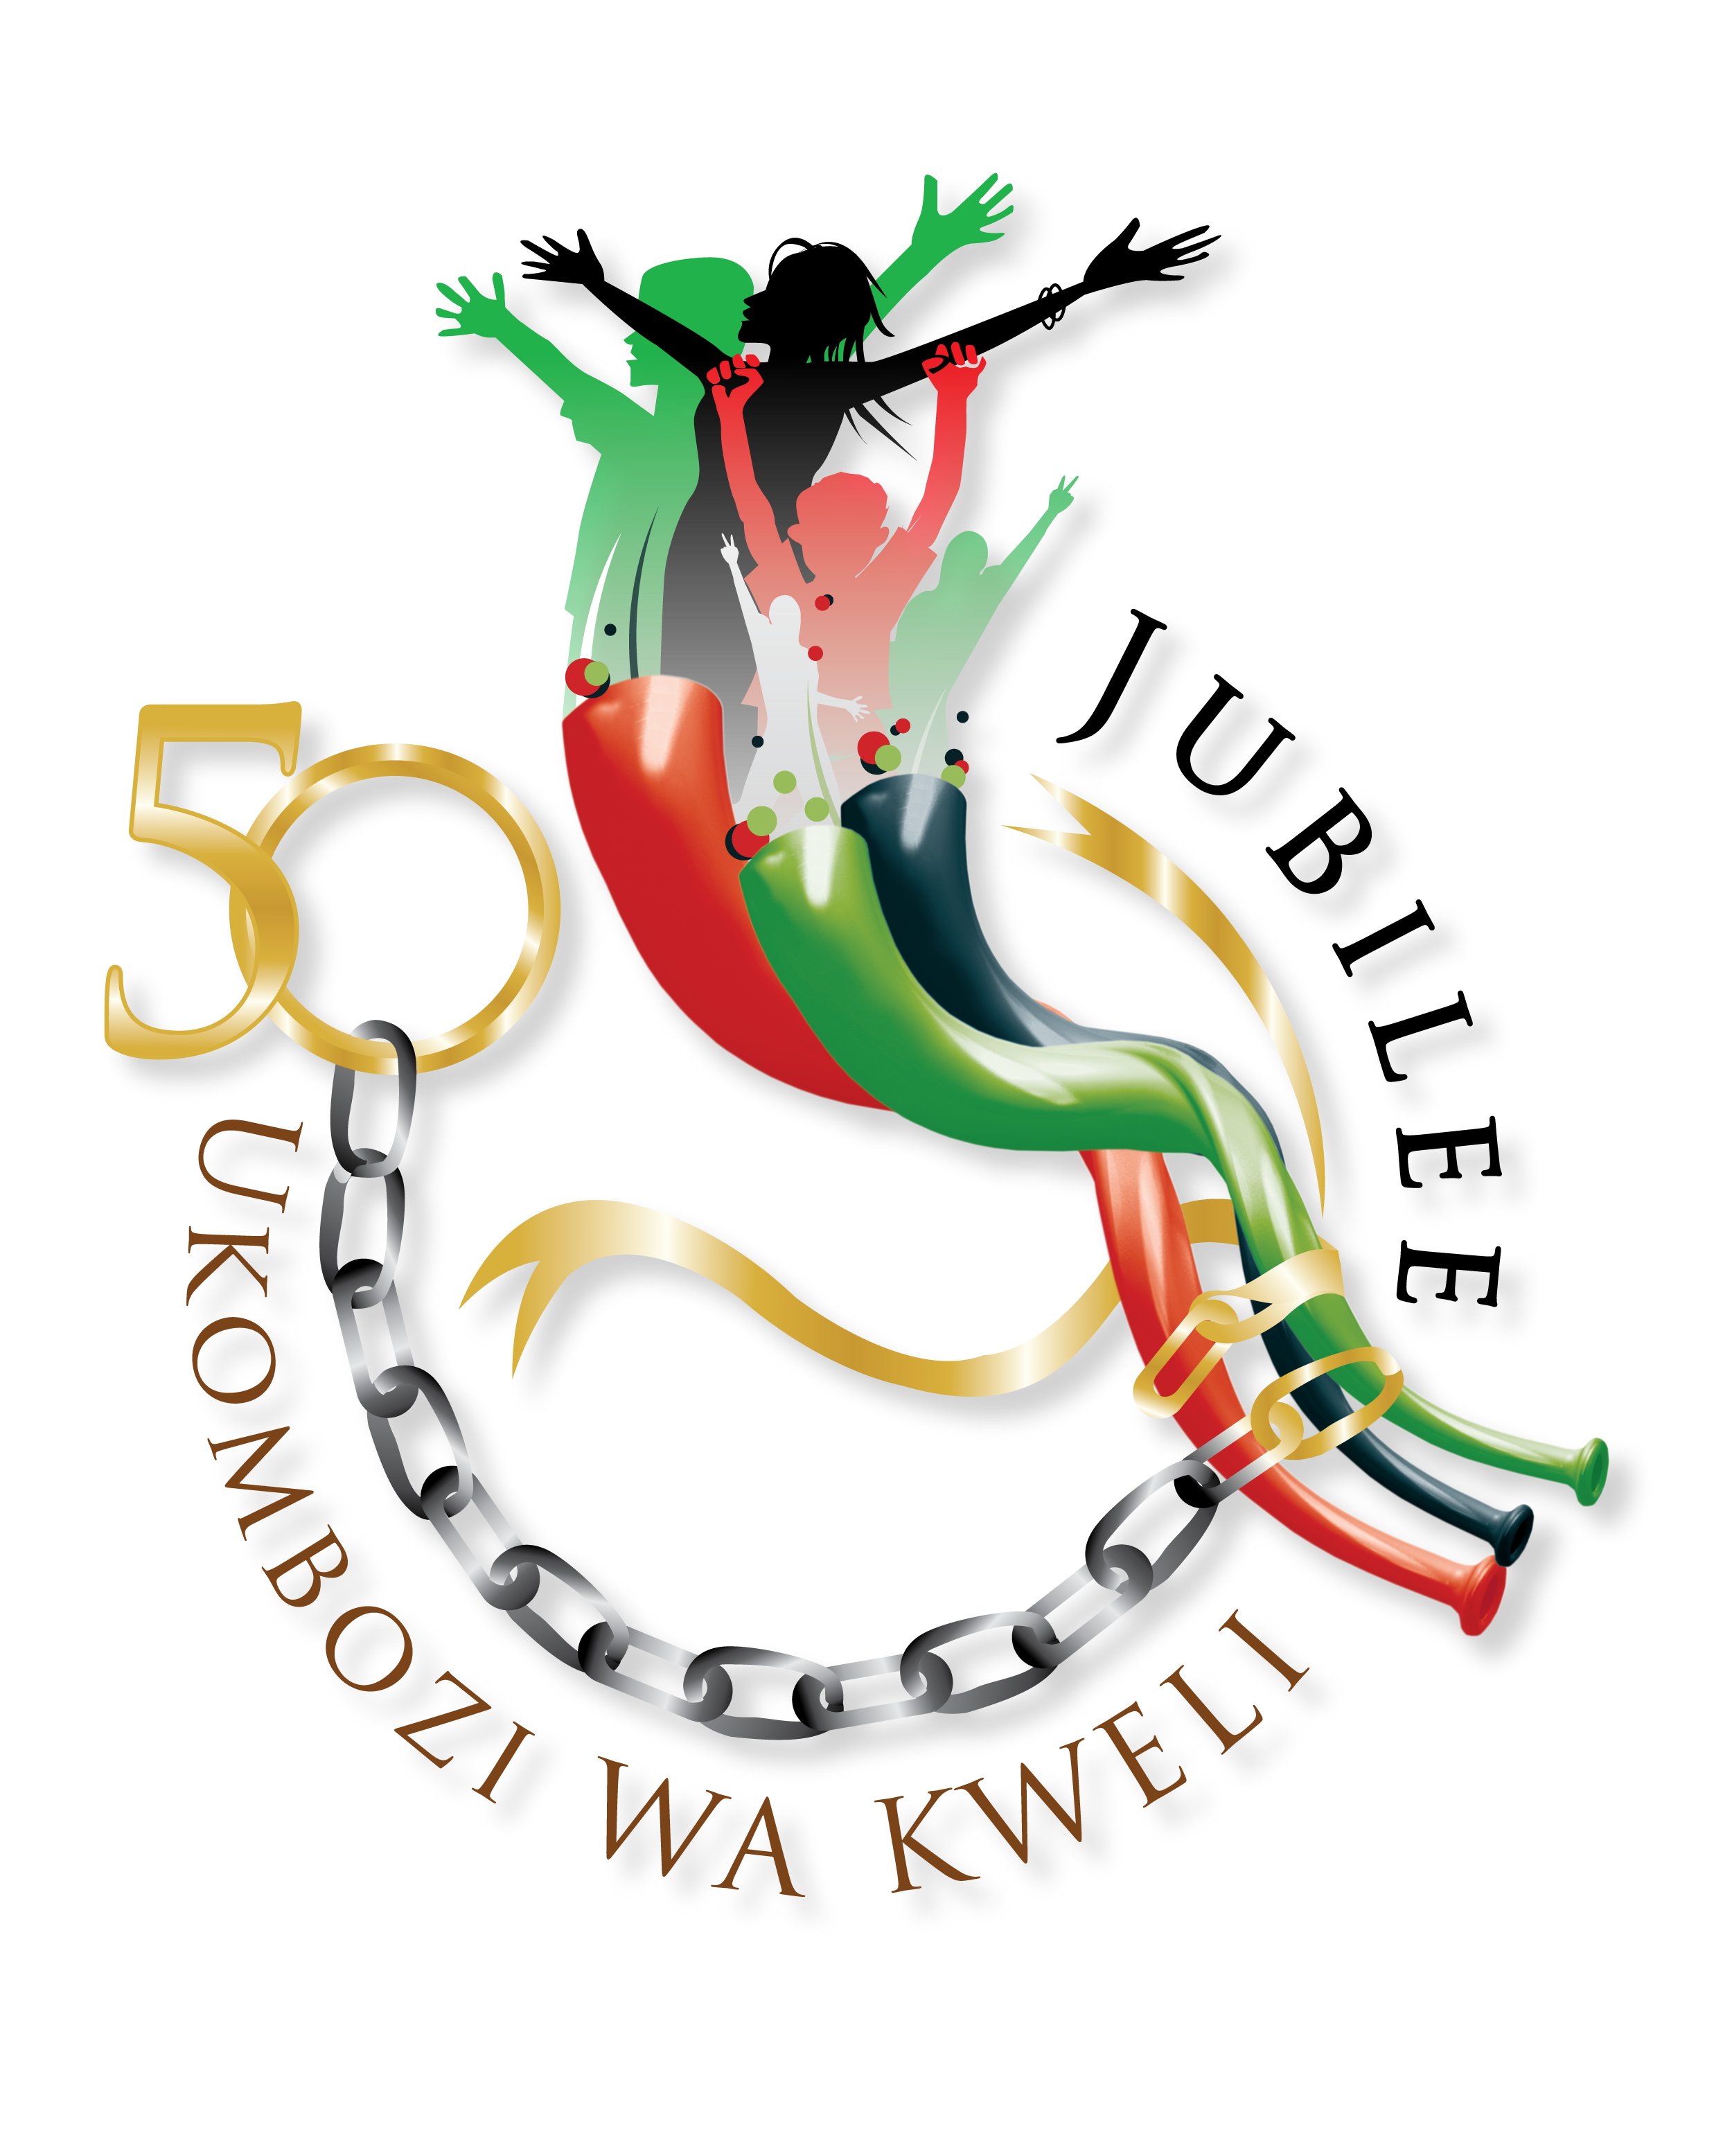 Kenya Jubilee - Ukombozi wa Kweli(1)